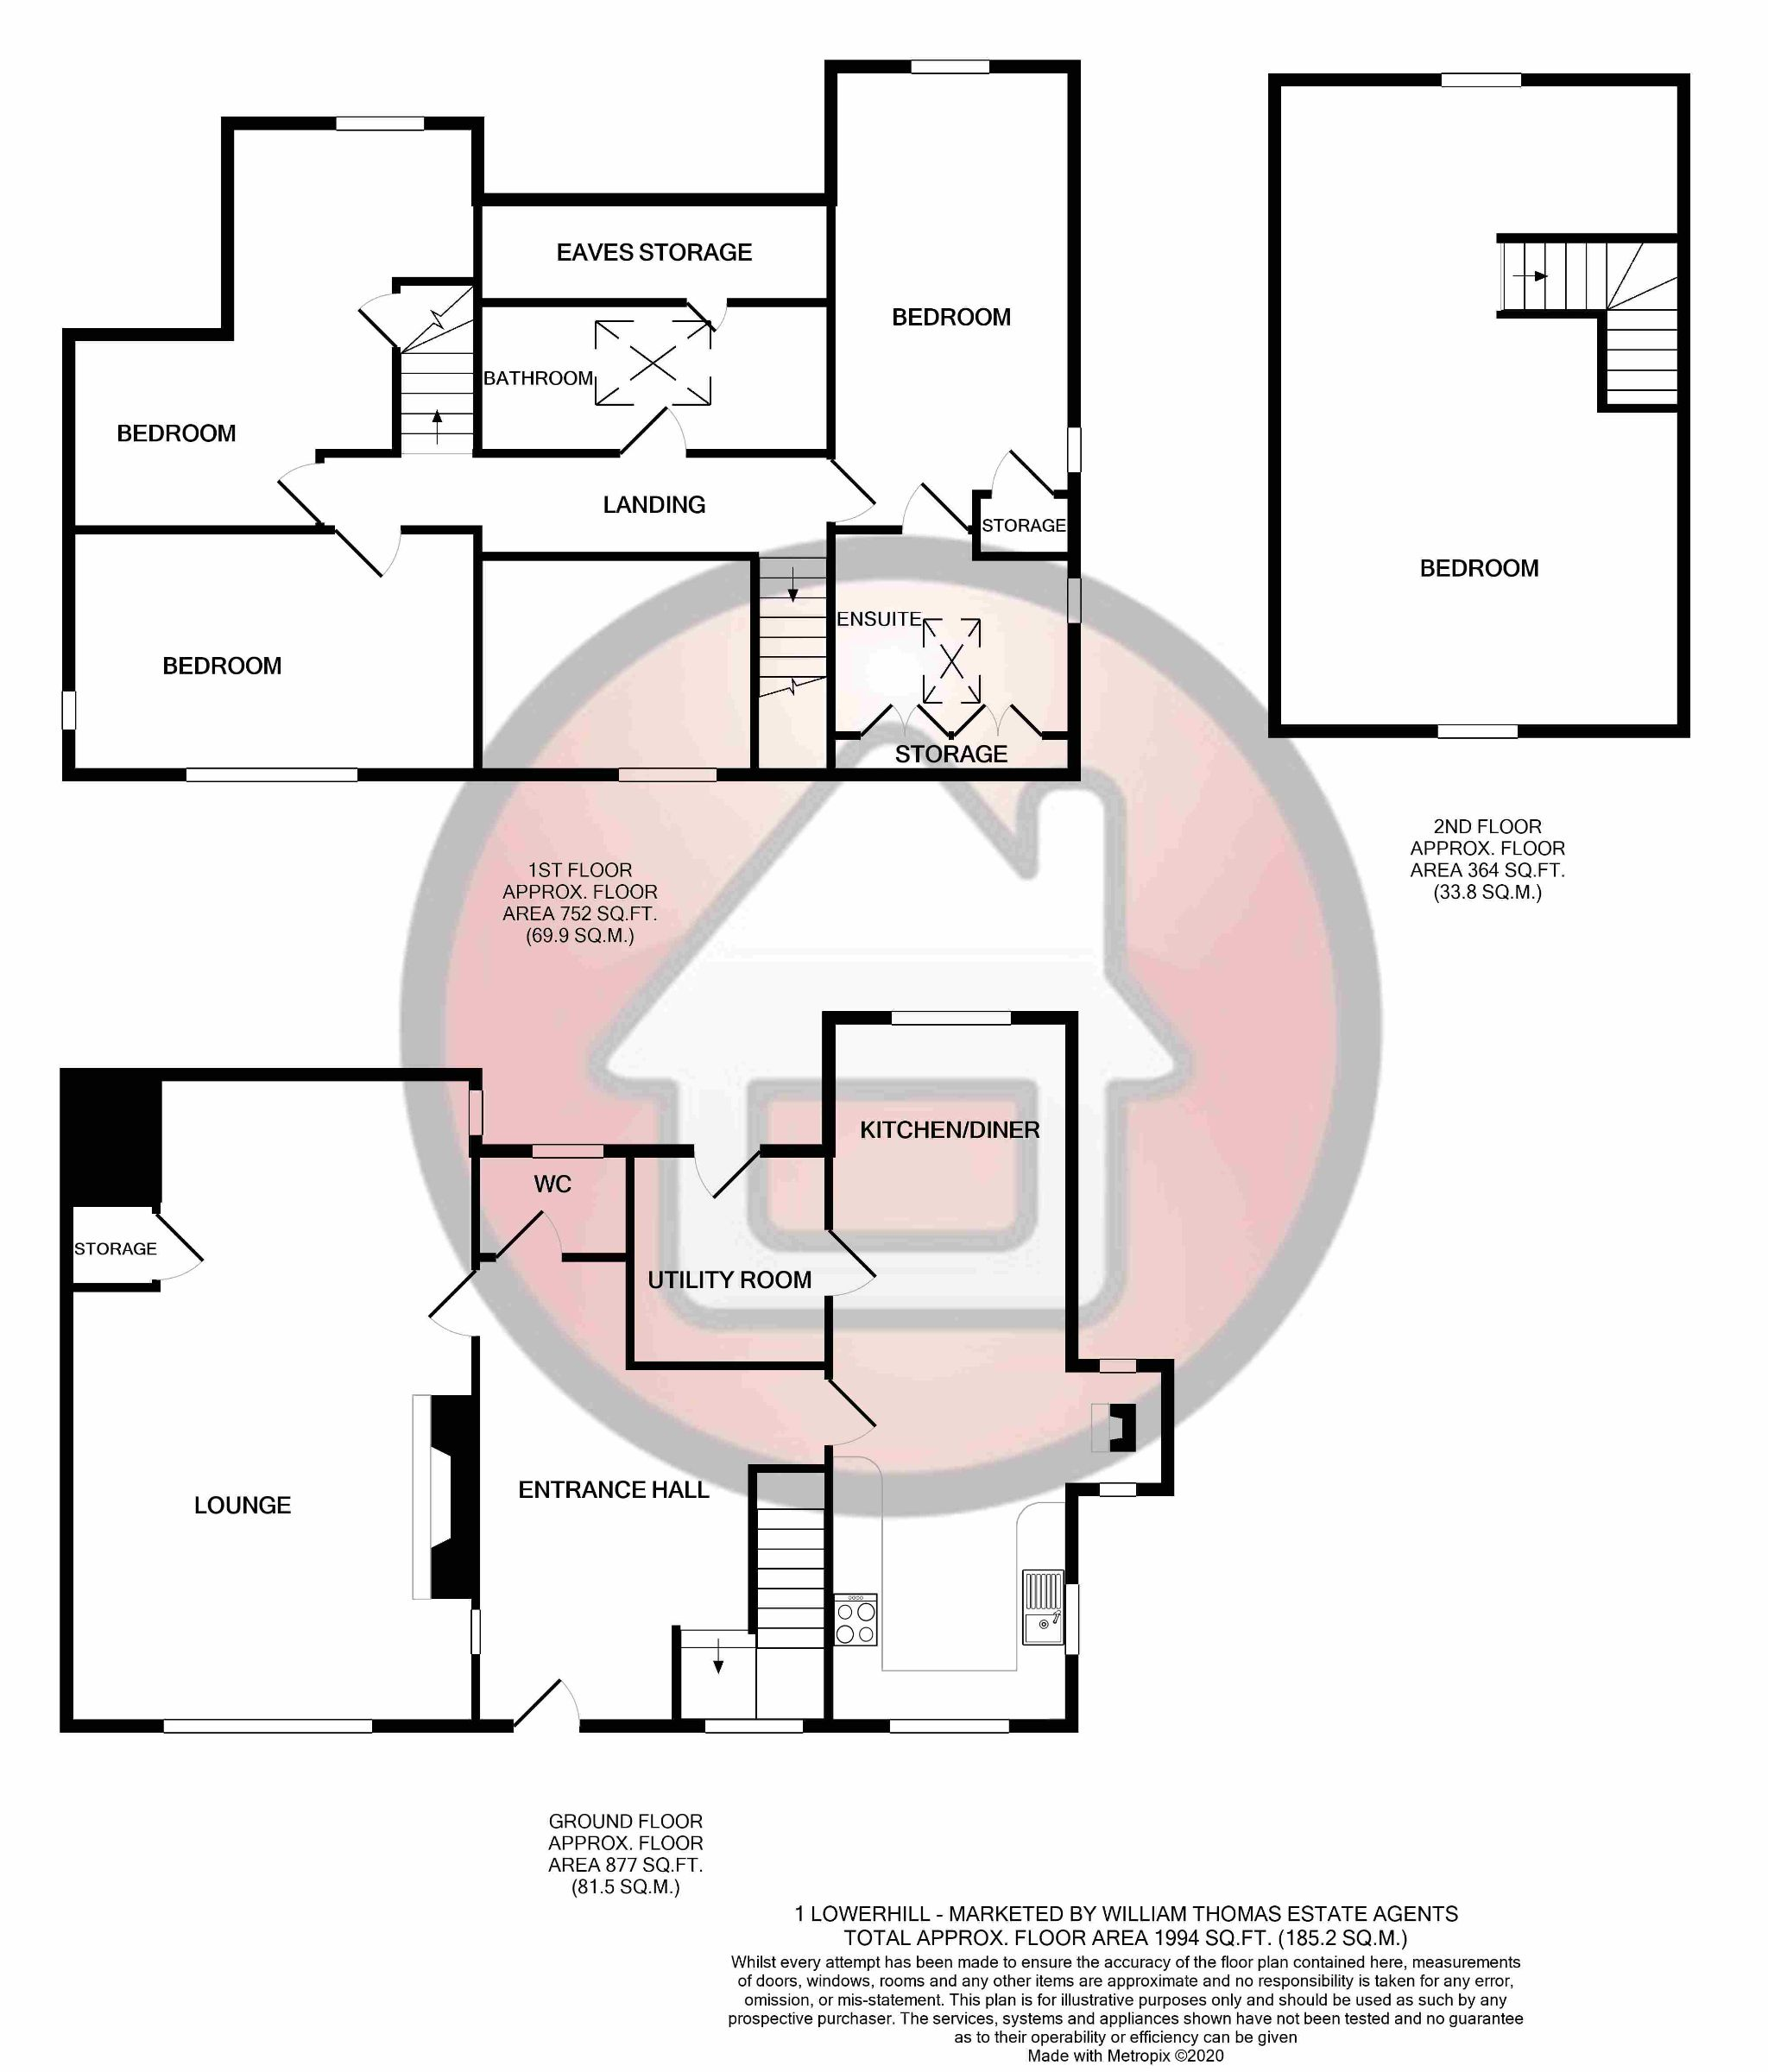 4 bedroom undefined house For Sale in Darwen - Floorplan 1